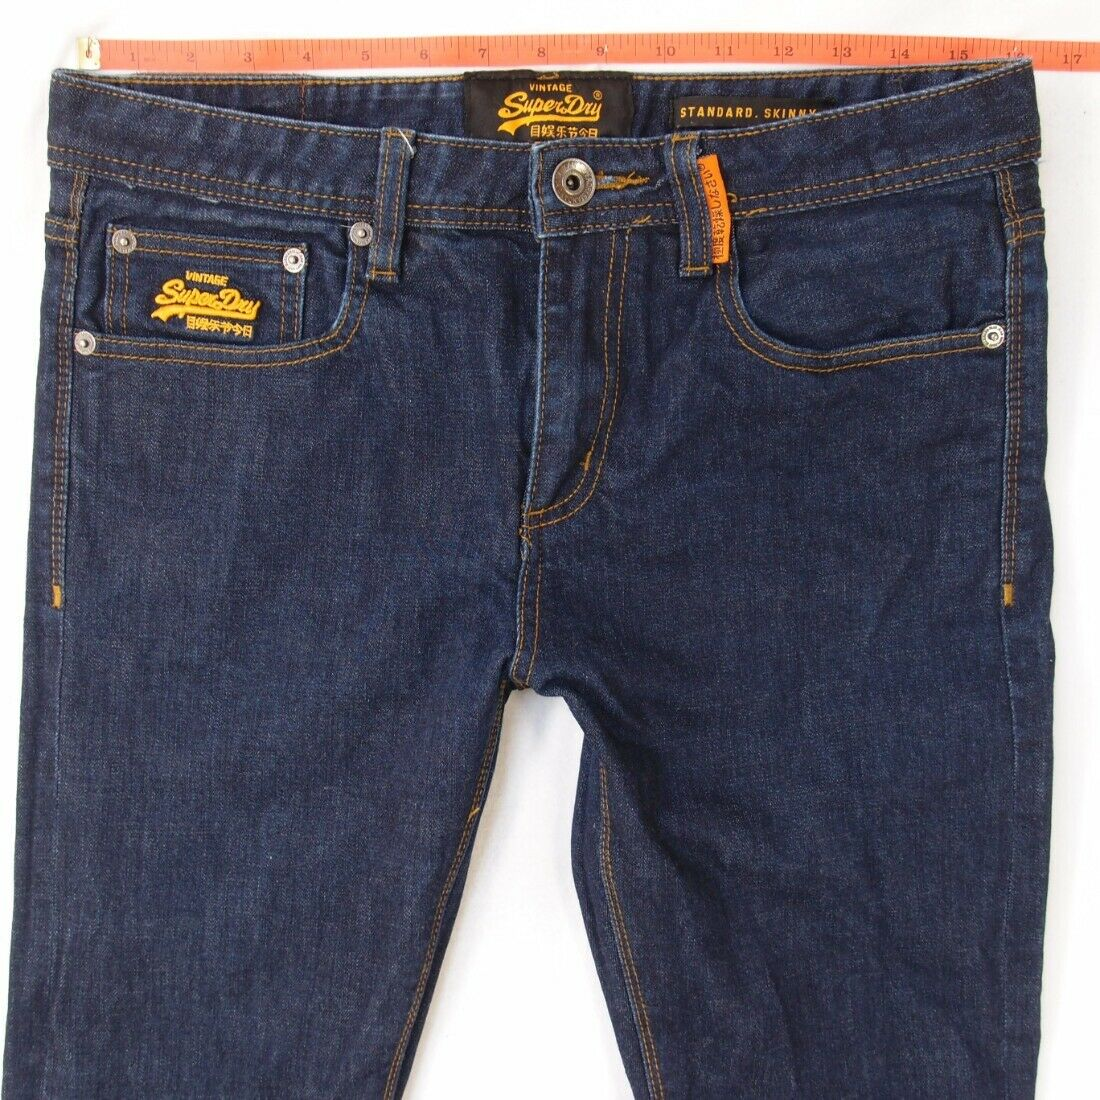 Mens SuperDry Standard Skinny Stretch bluee Jeans W31 L34